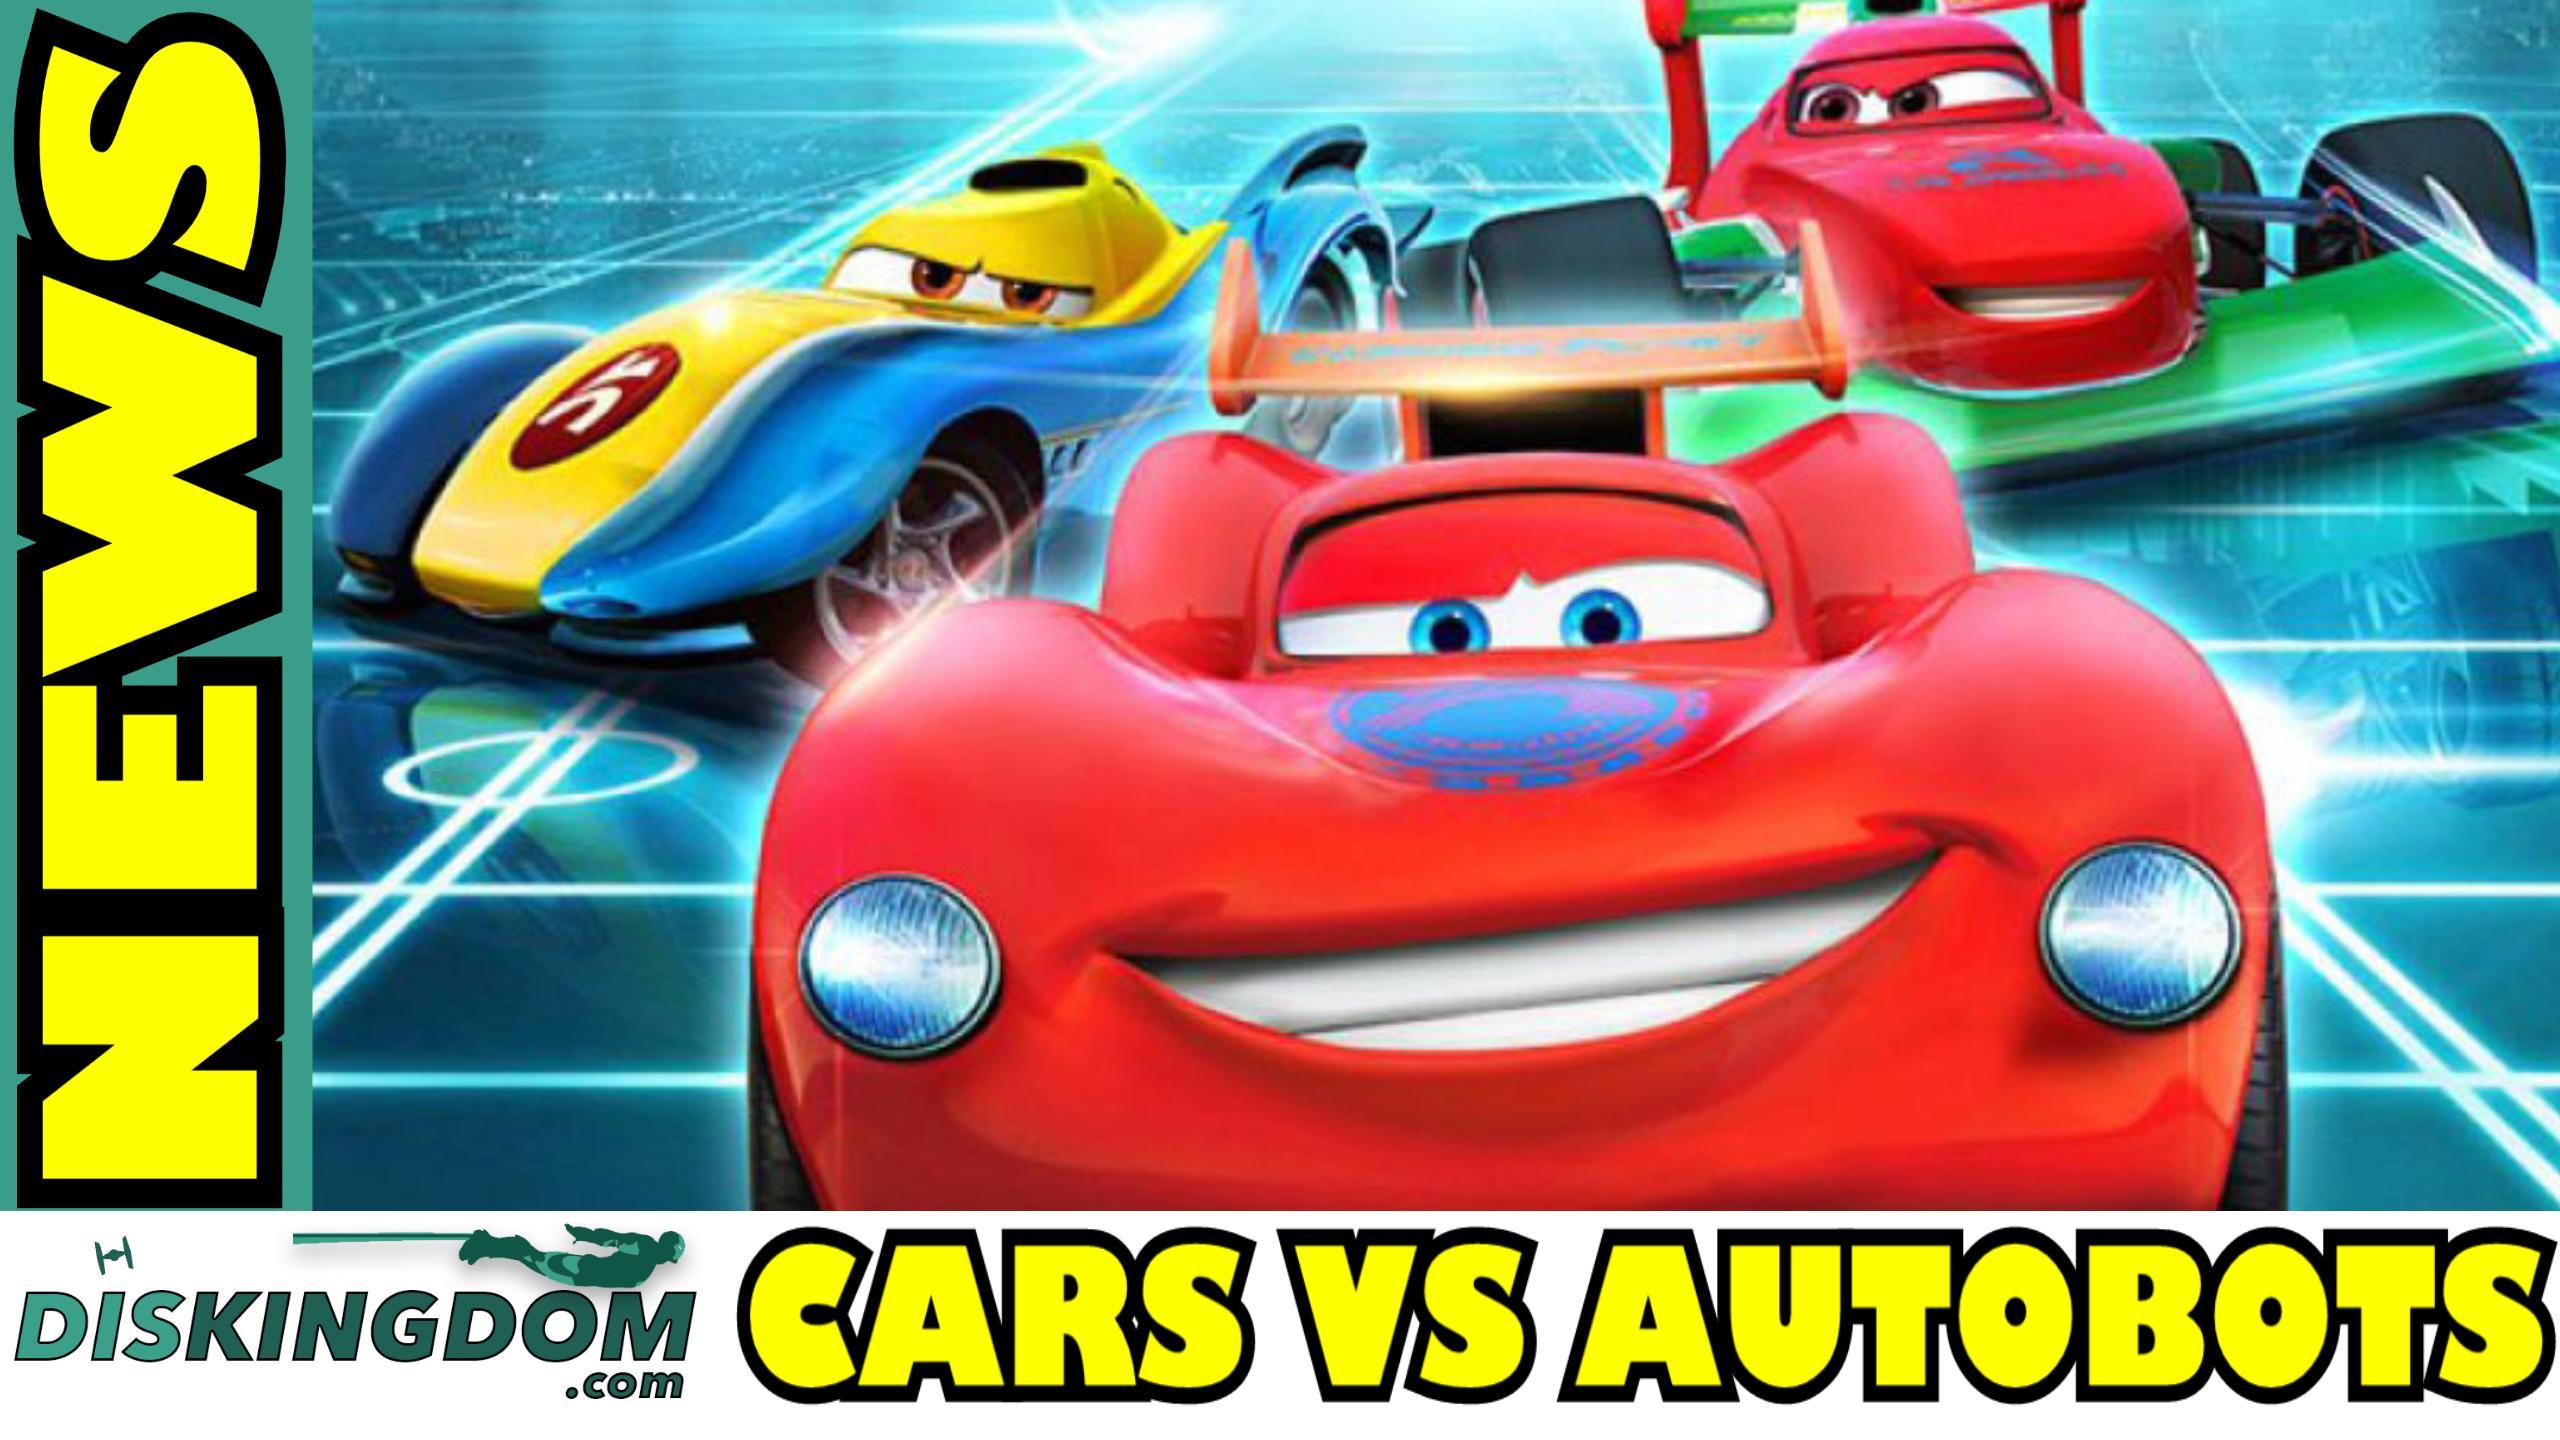 Disney's Cars Beats The Chinese Autobots   DK Disney News